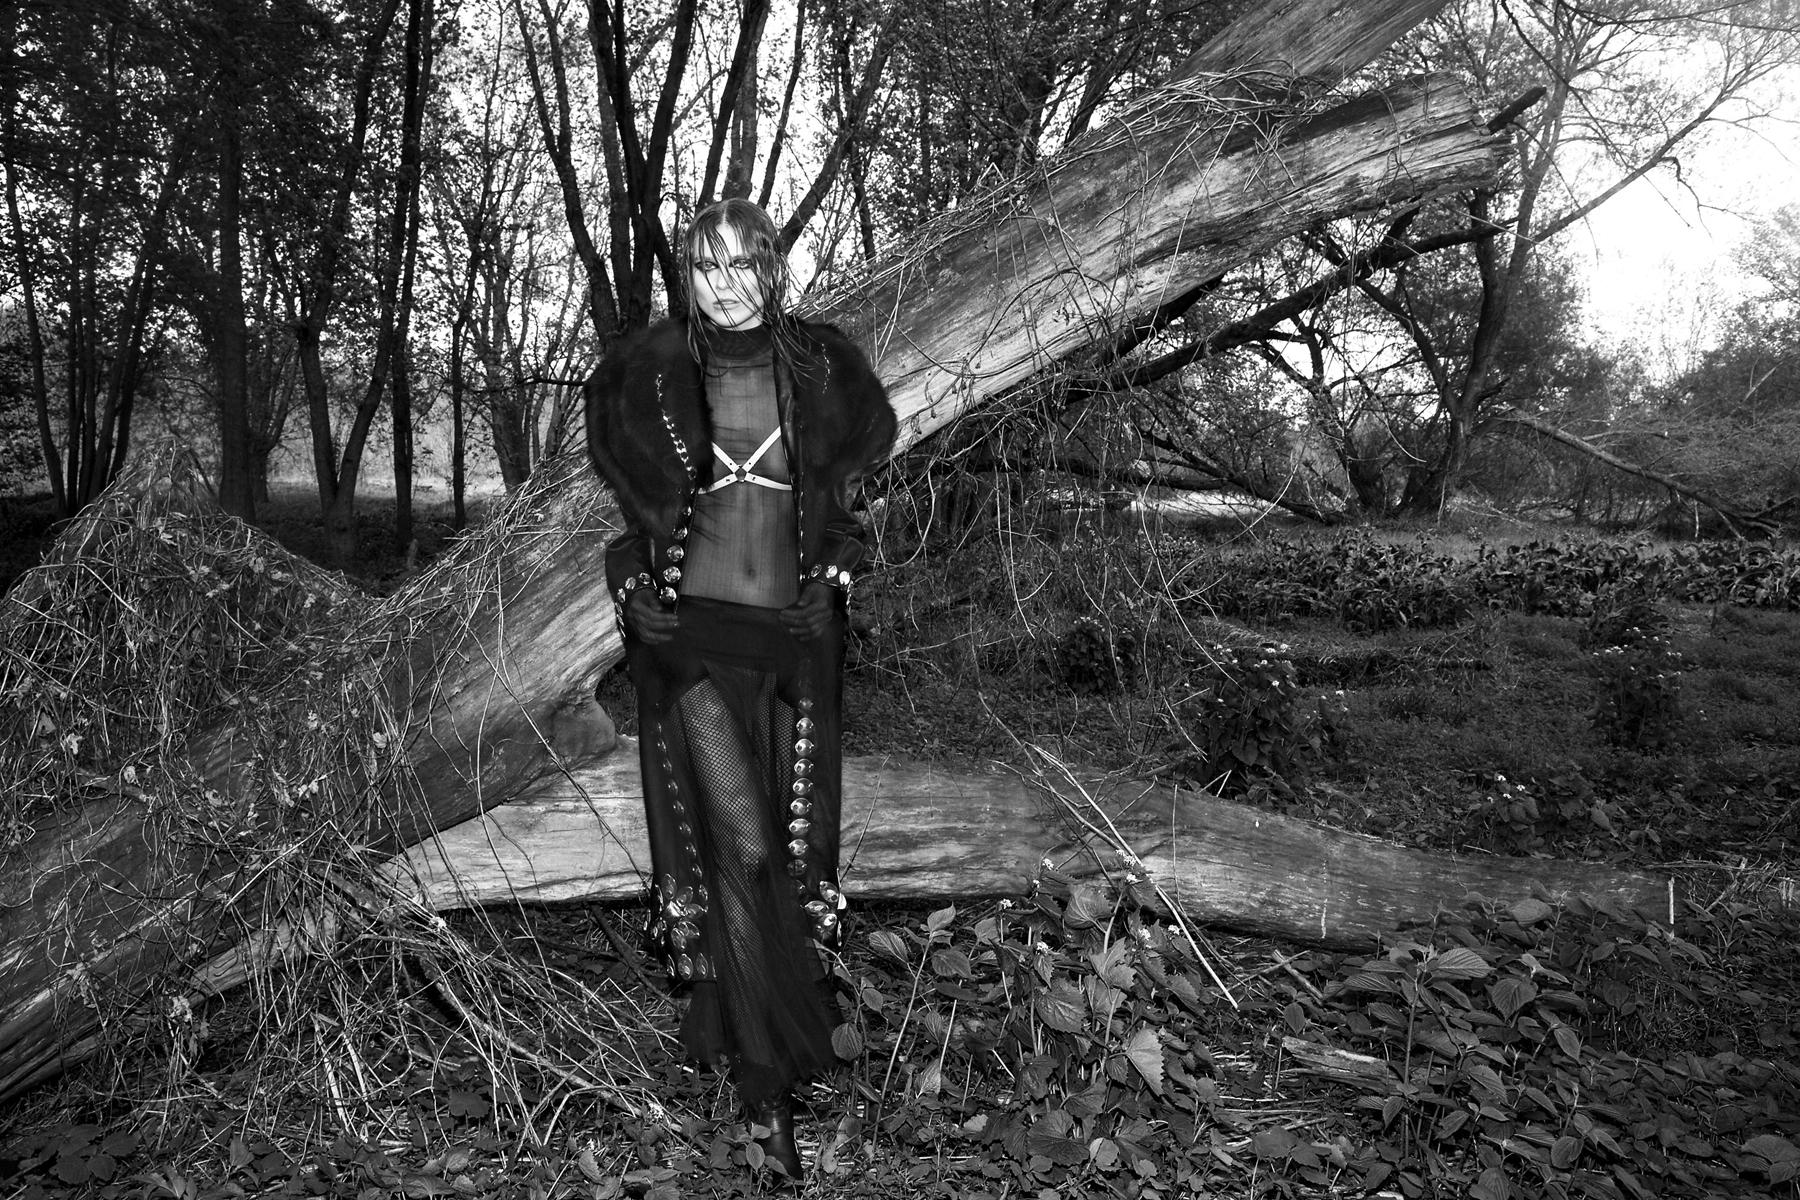 Coat  Laurel Dewitt,  Sheer top & skirt both  Breelayne  ,Harness  Laruicci,  Gloves  LaCrasia  Models own  Jimmy Choo boots